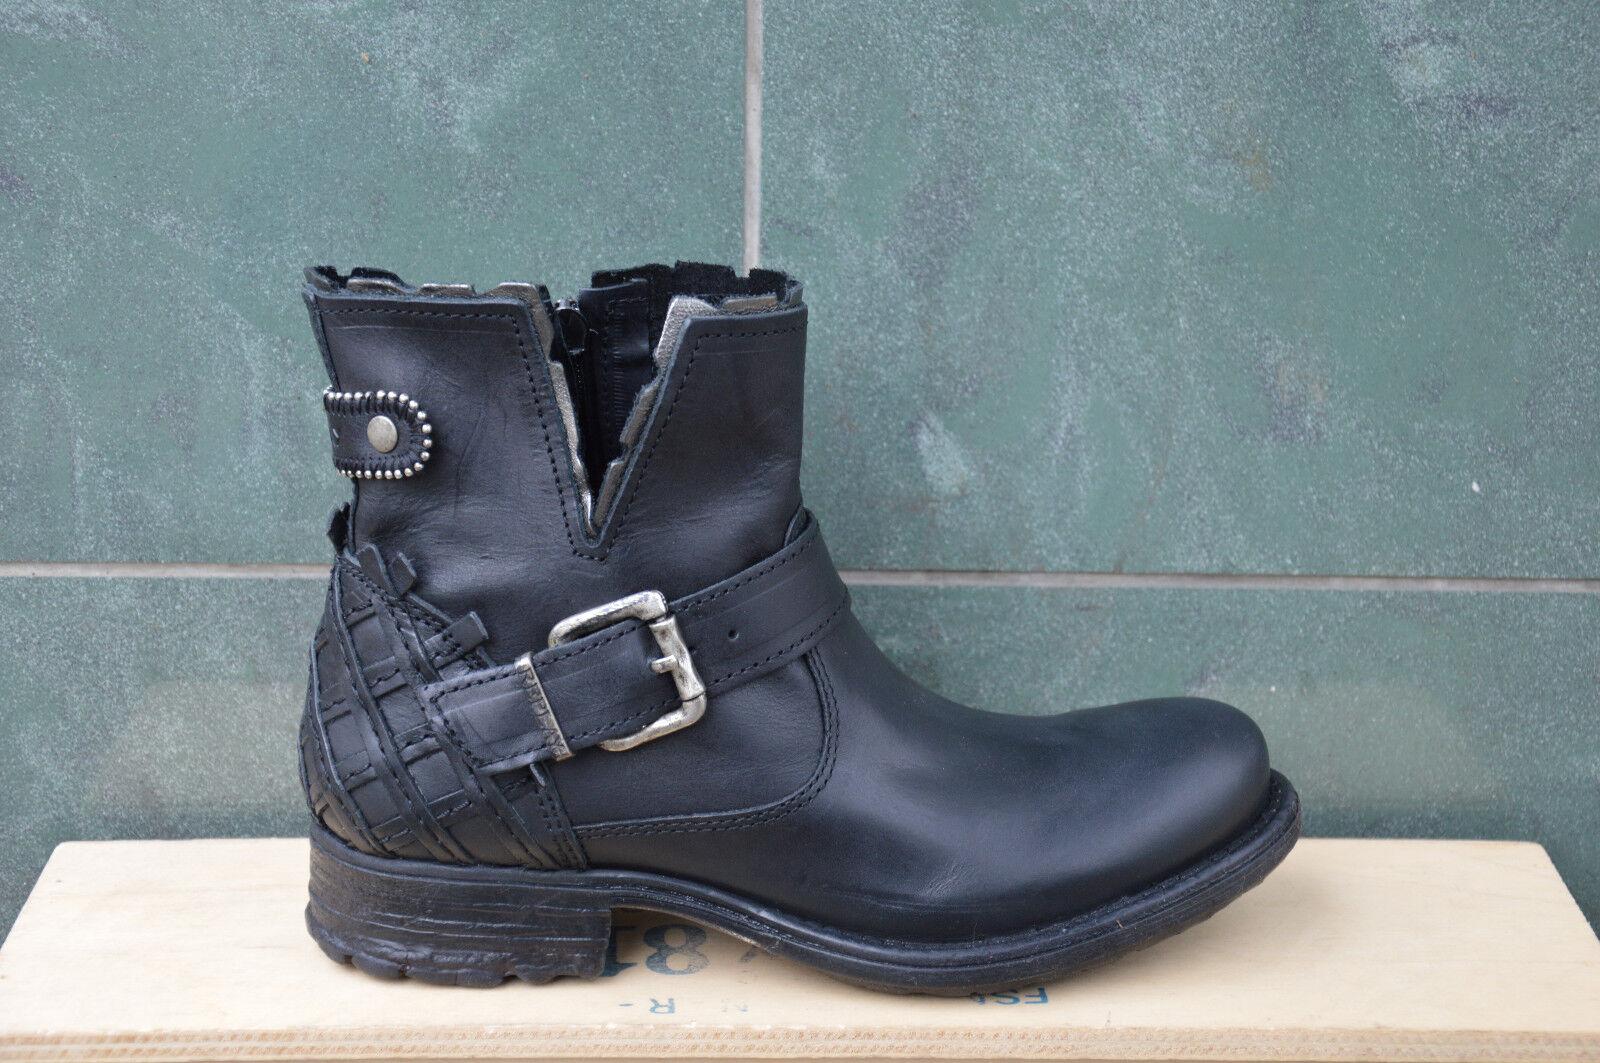 Zapatos señora zapatos Replay botín Shoes zapatos botas de cuero negro Black